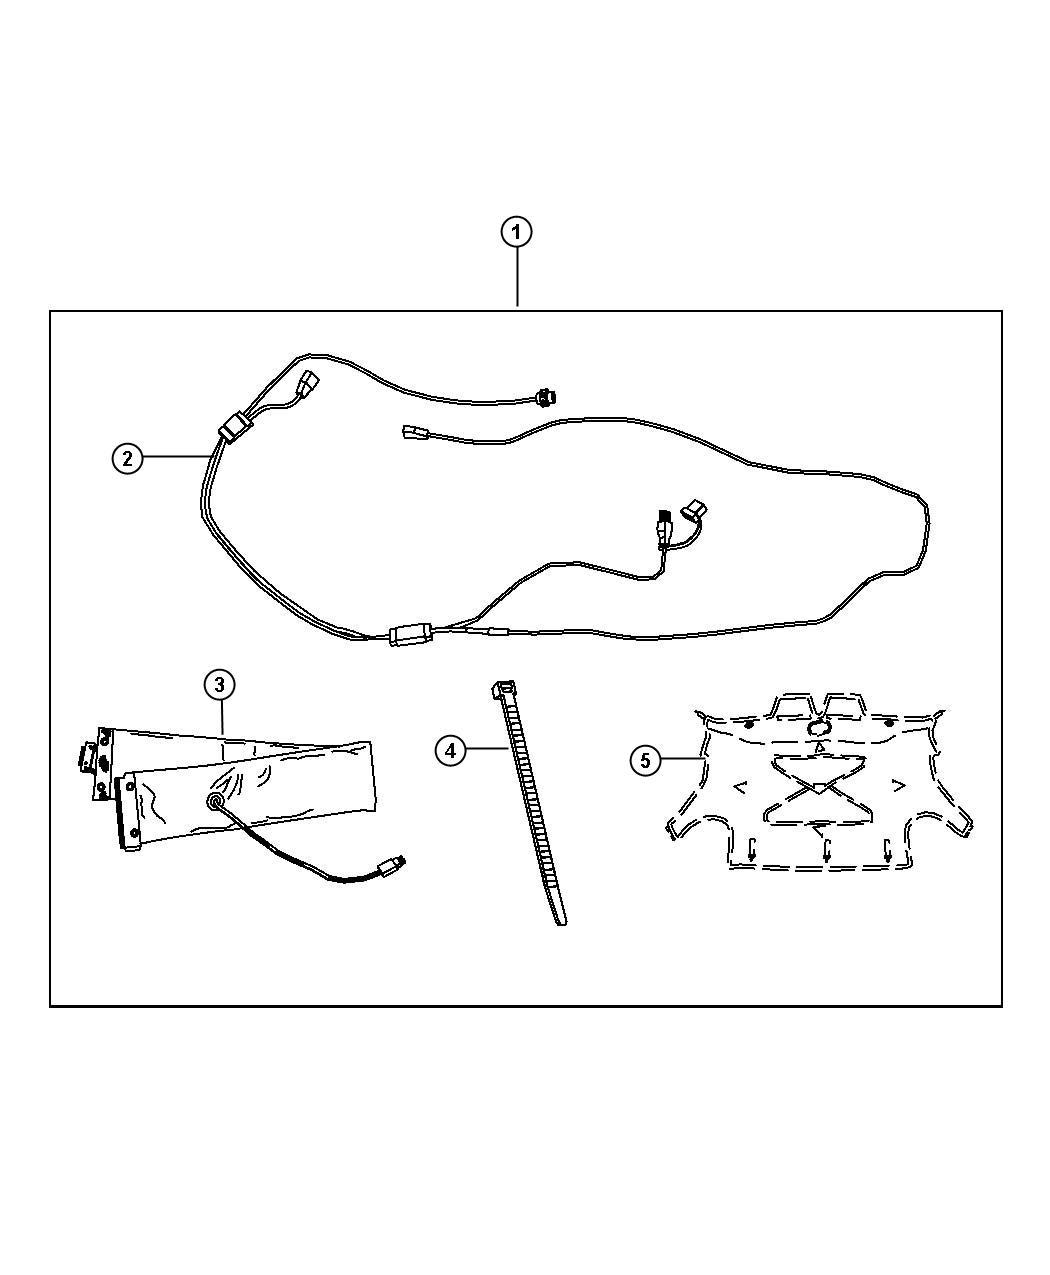 Dodge Ram Cord Engine Block Heater 3 Leg Cord For